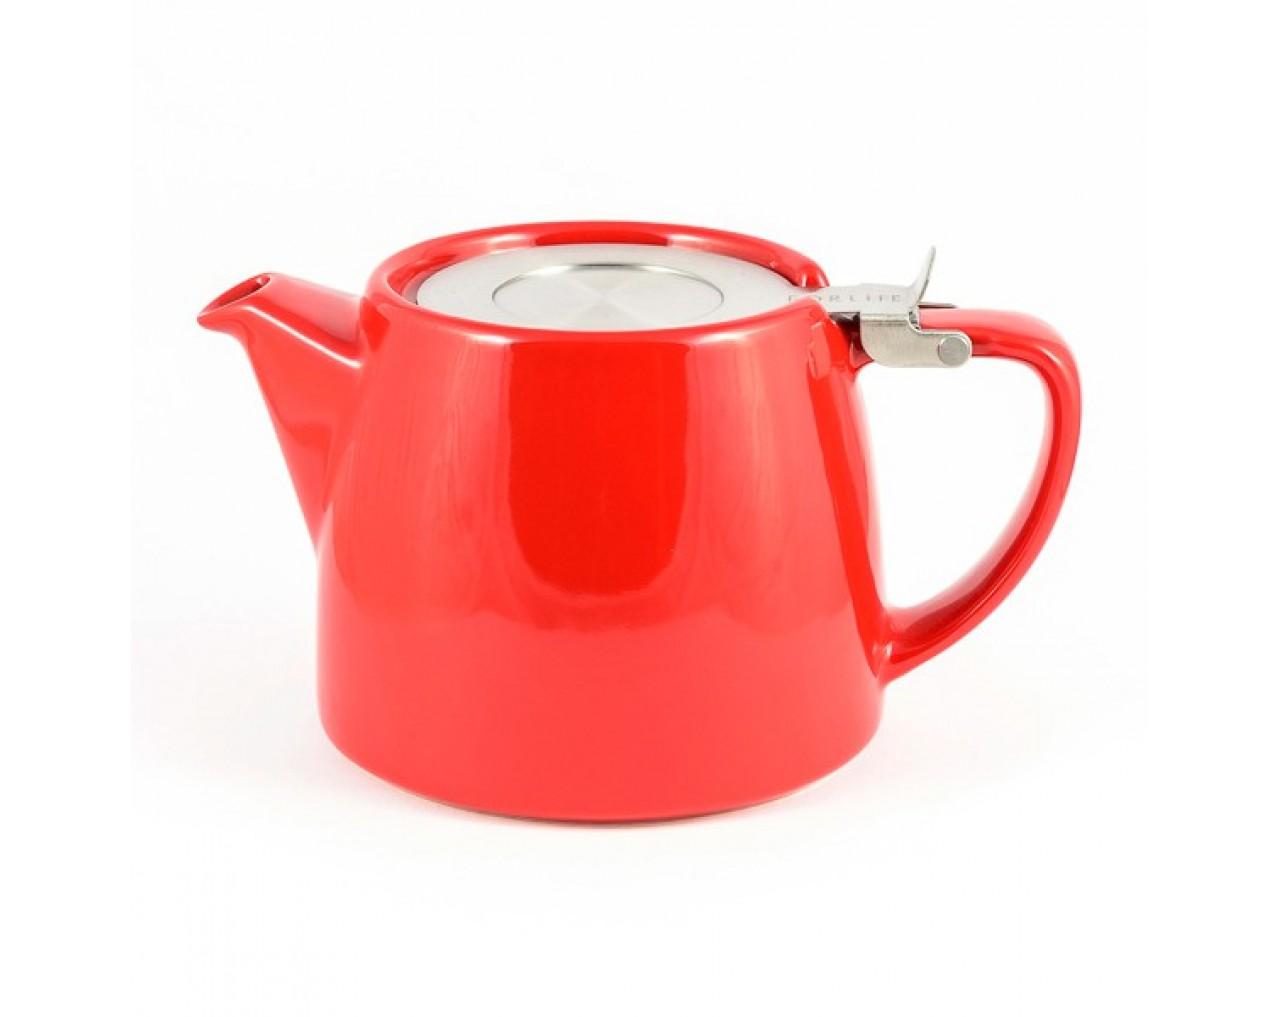 Red Stump Teapot